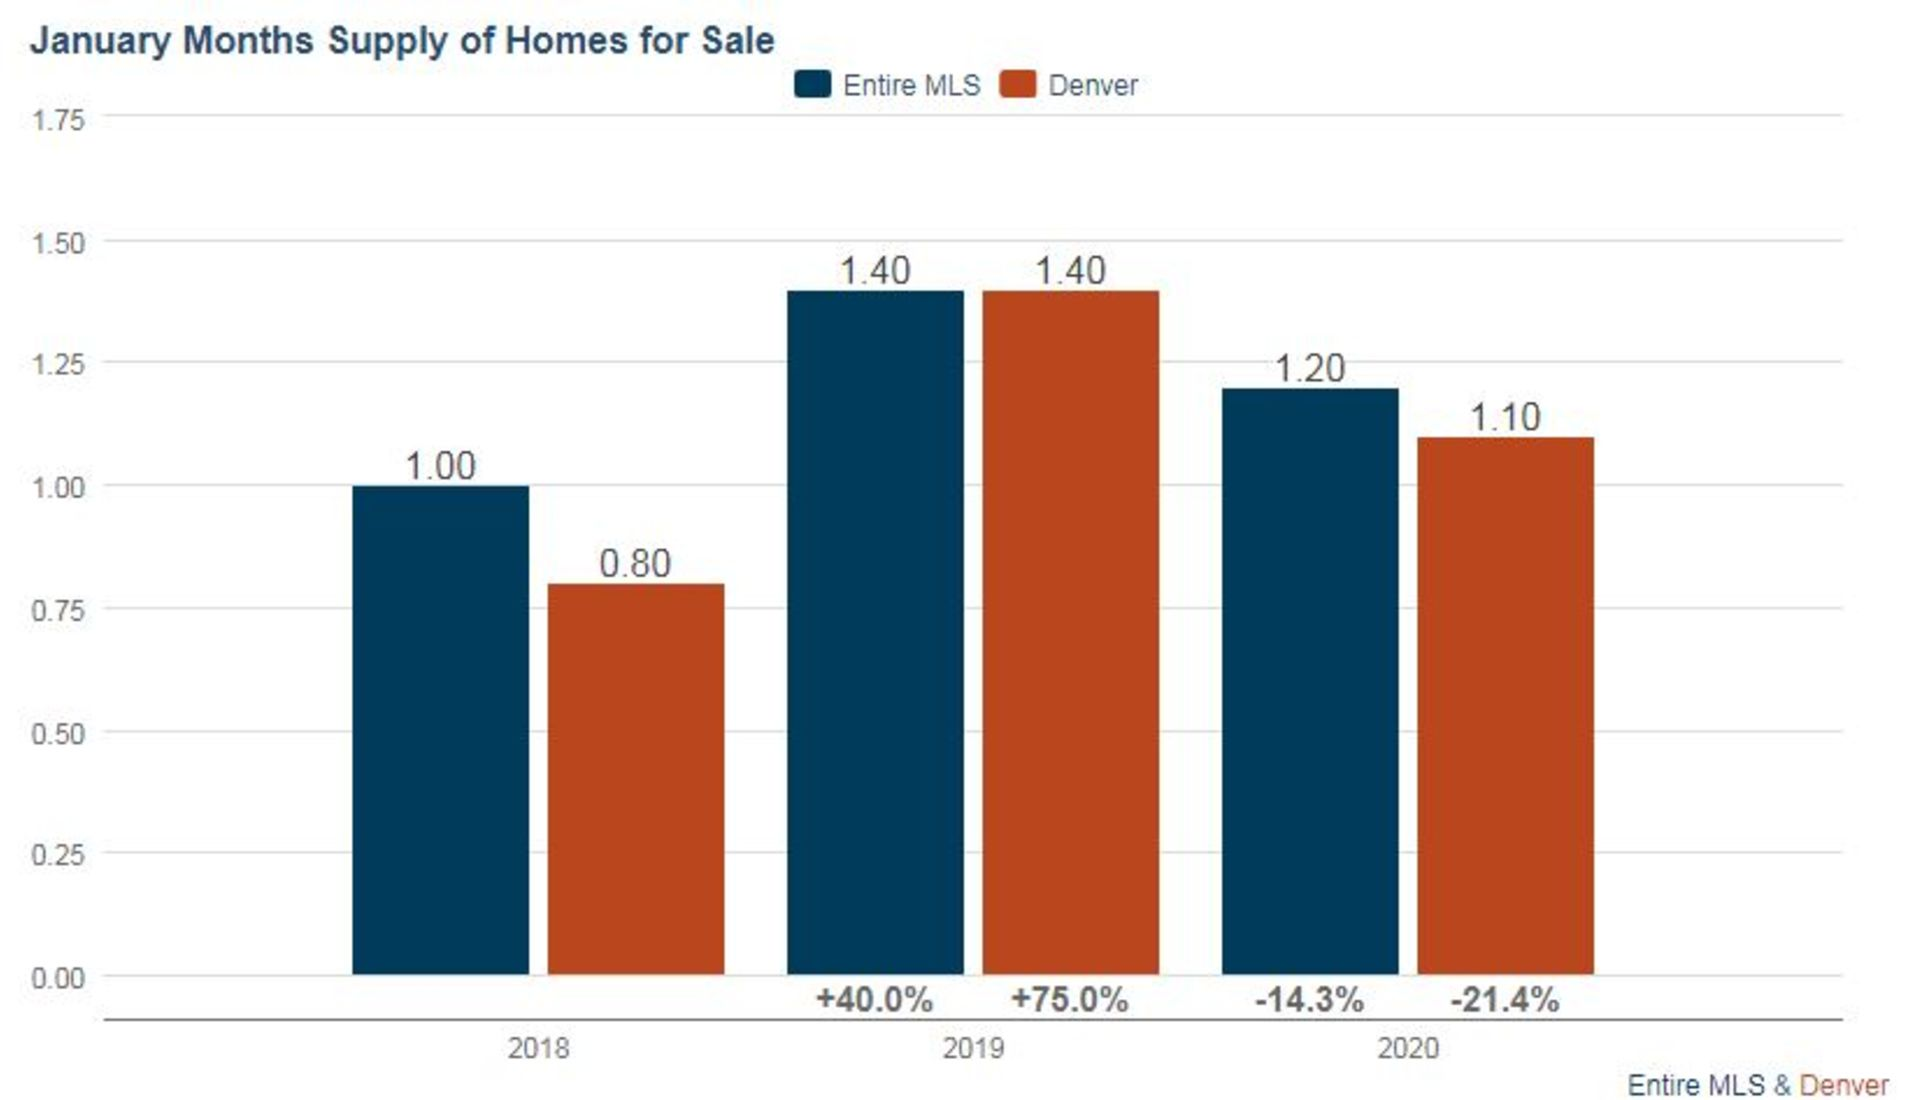 Denver Real Estate Market Update February 2020